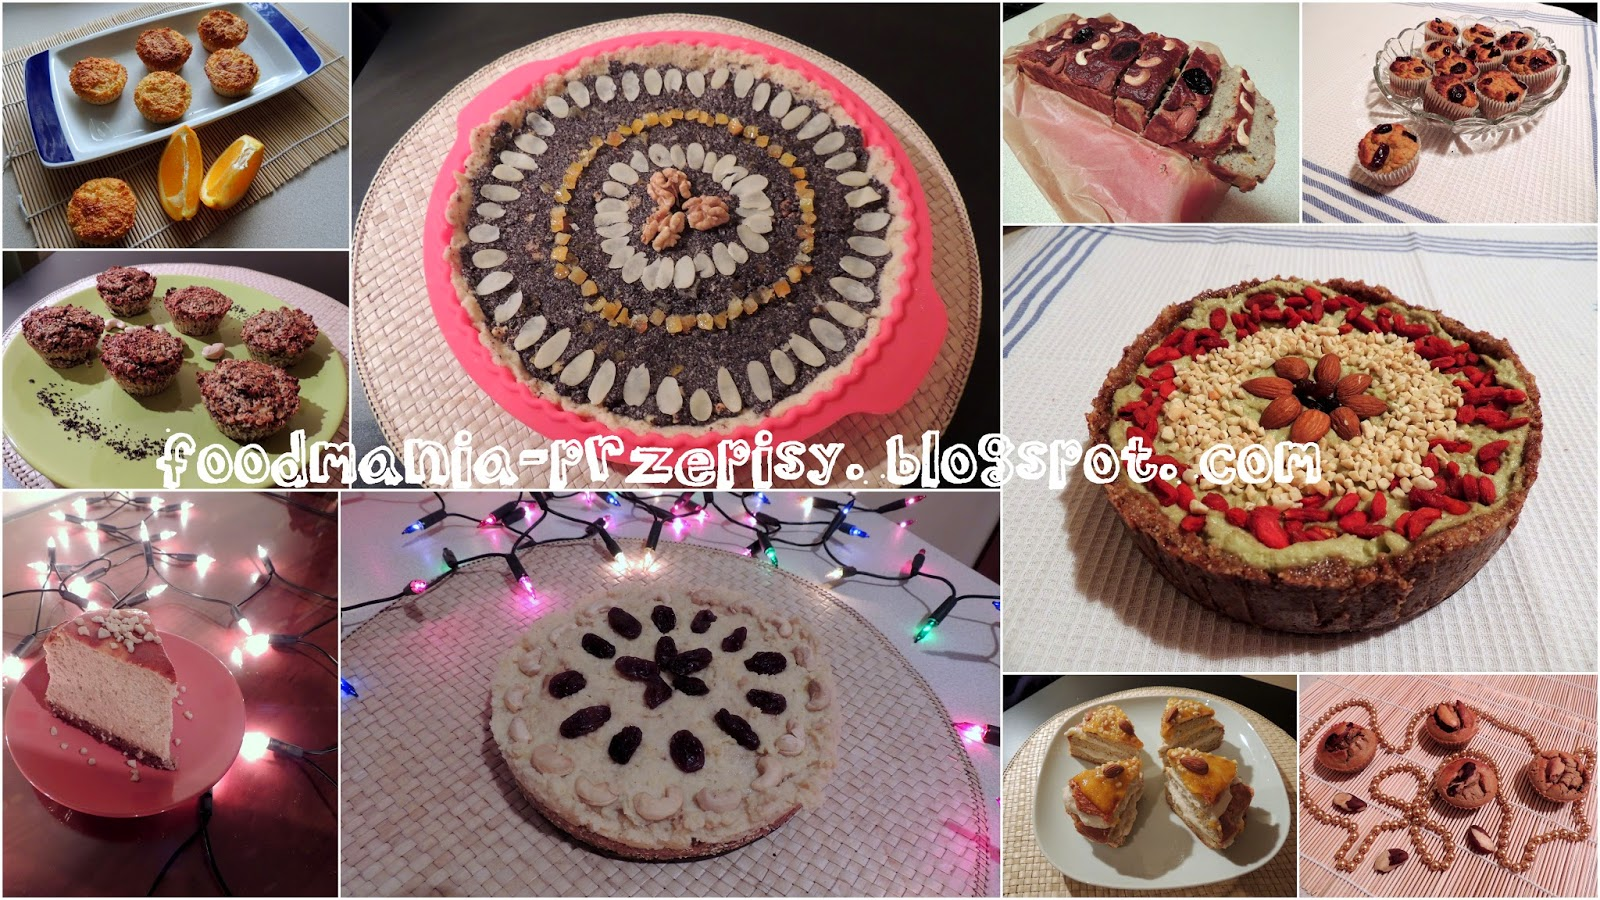 http://foodmania-przepisy.blogspot.com/p/ciasta-i-ciastka_15.html